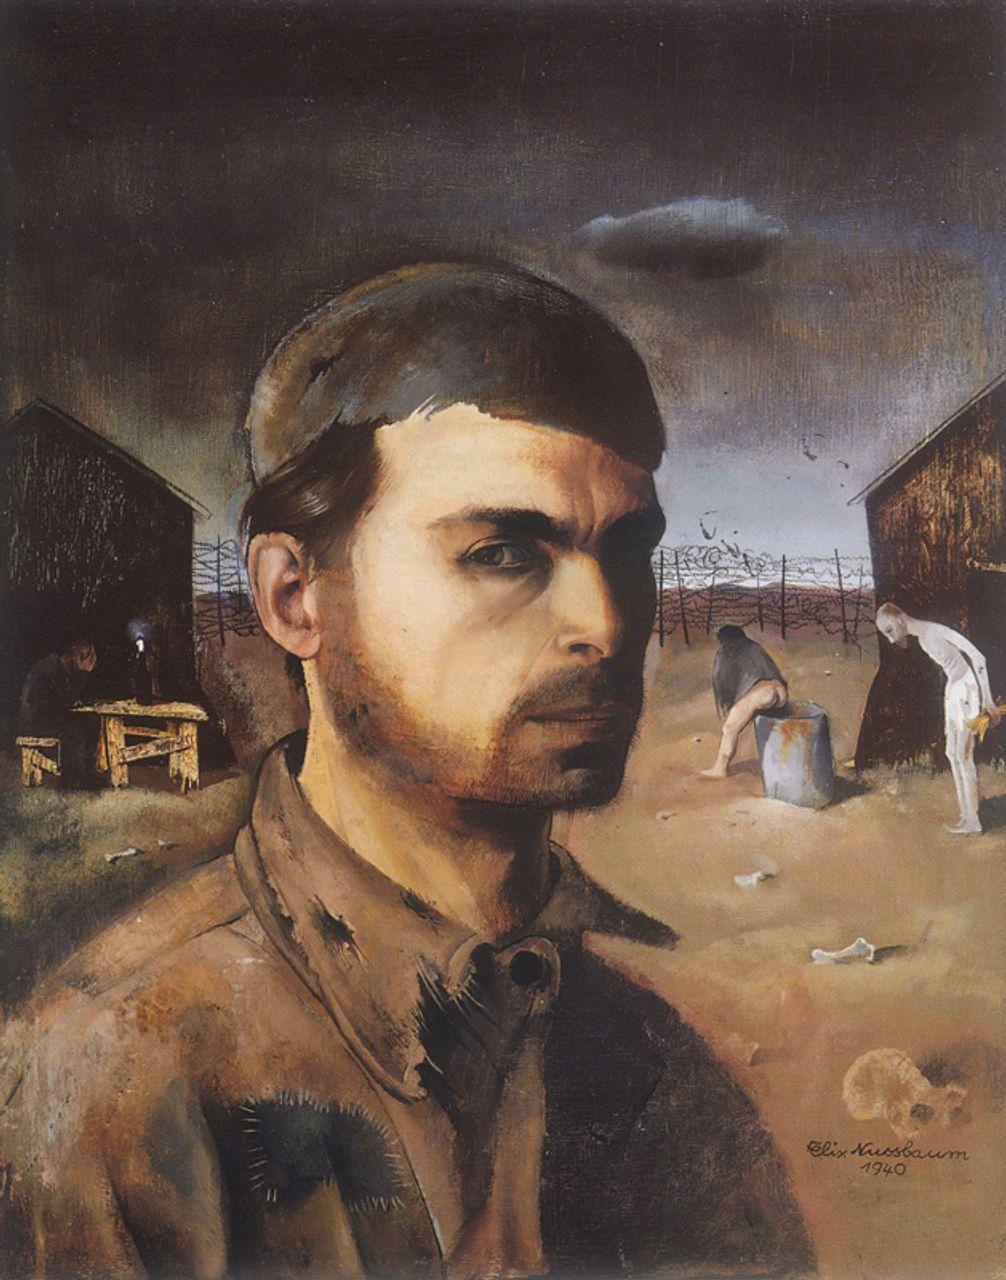 Felix Nussbaum, Self-Portrait in the Camp (1940)